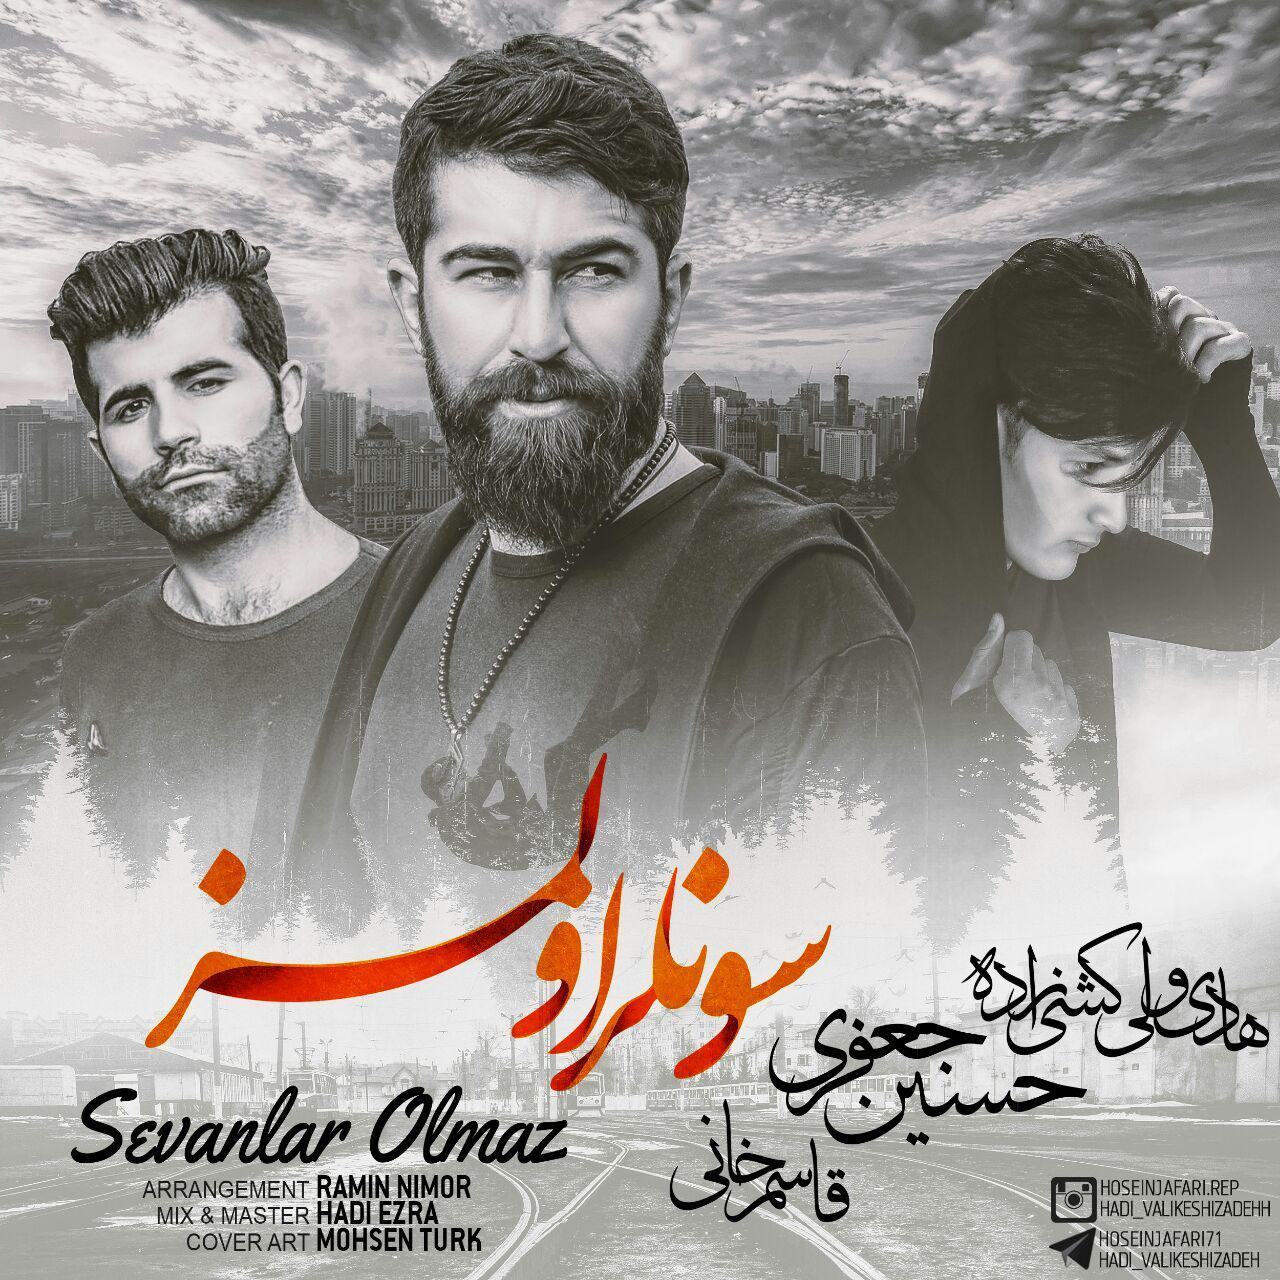 http://s9.picofile.com/file/8331155234/11Hadi_Valikeshizadeh_Hossein_Jafari_Feat_Ghasem_Khani_Sevanlar_Olmaz.jpg